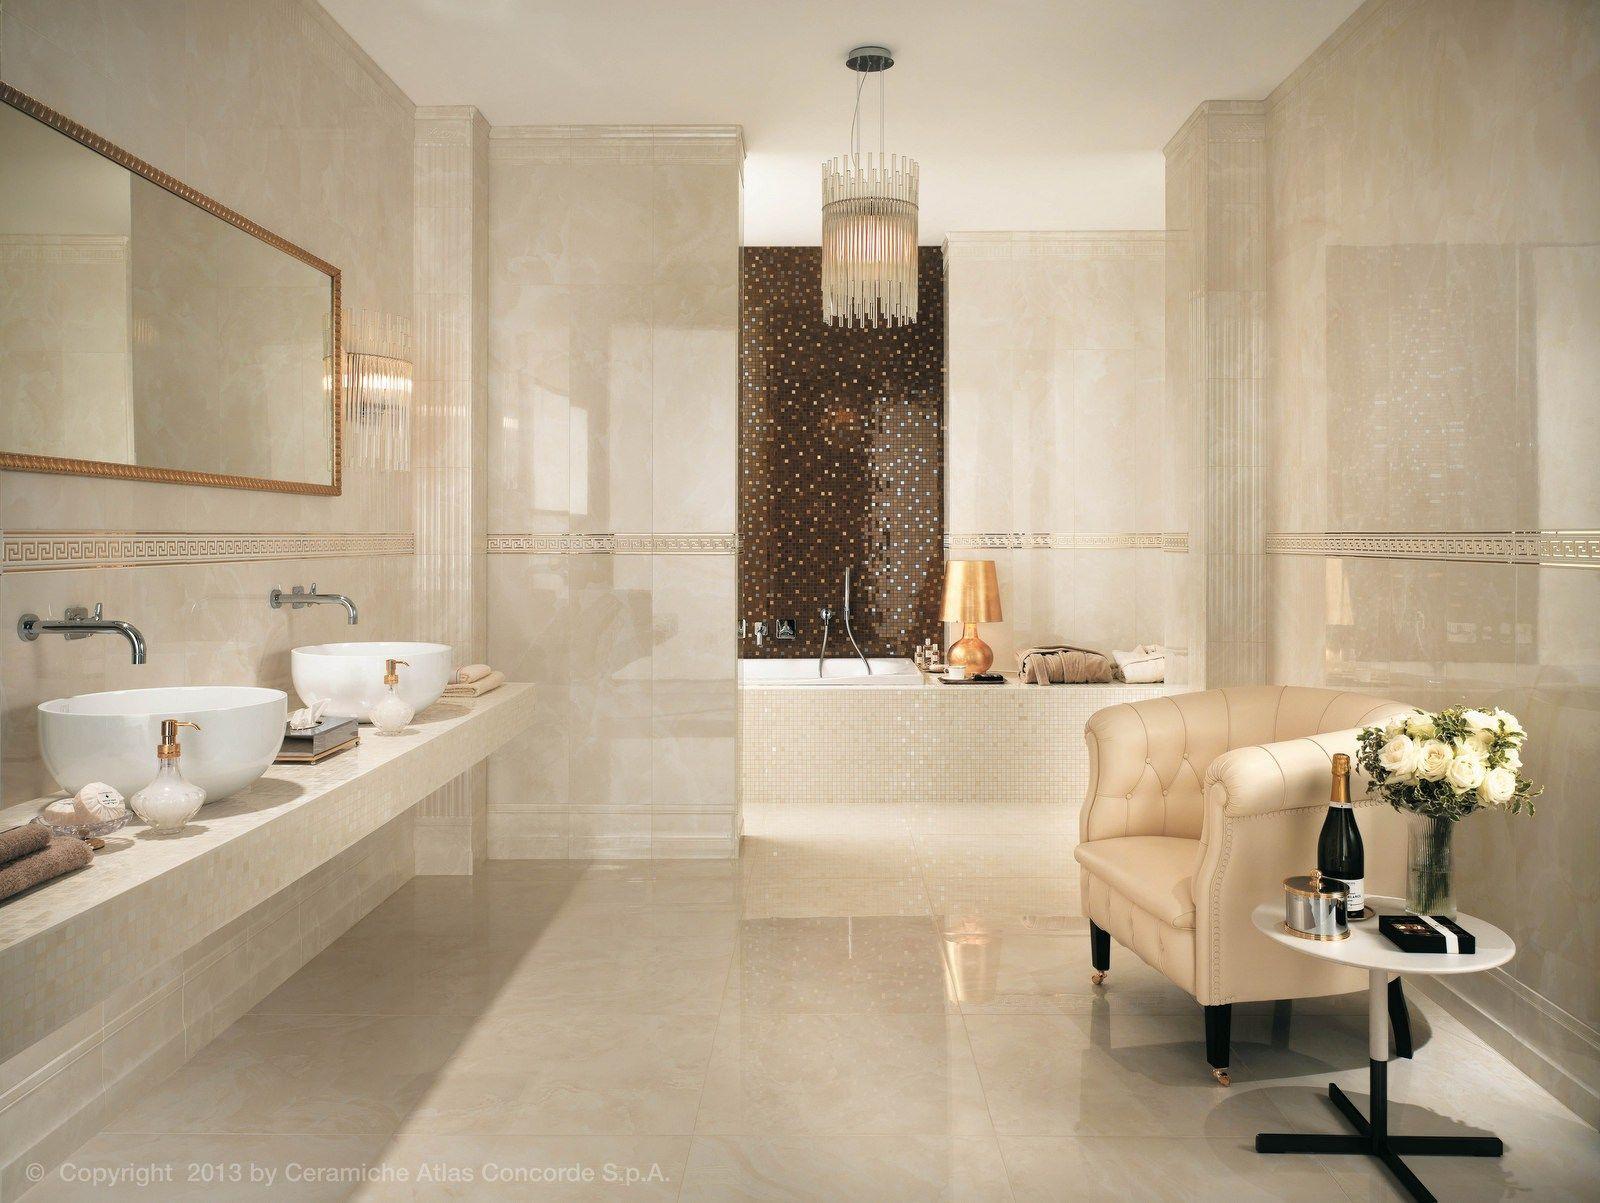 Rivestimento in ceramica a pasta bianca effetto marmo marvel wall